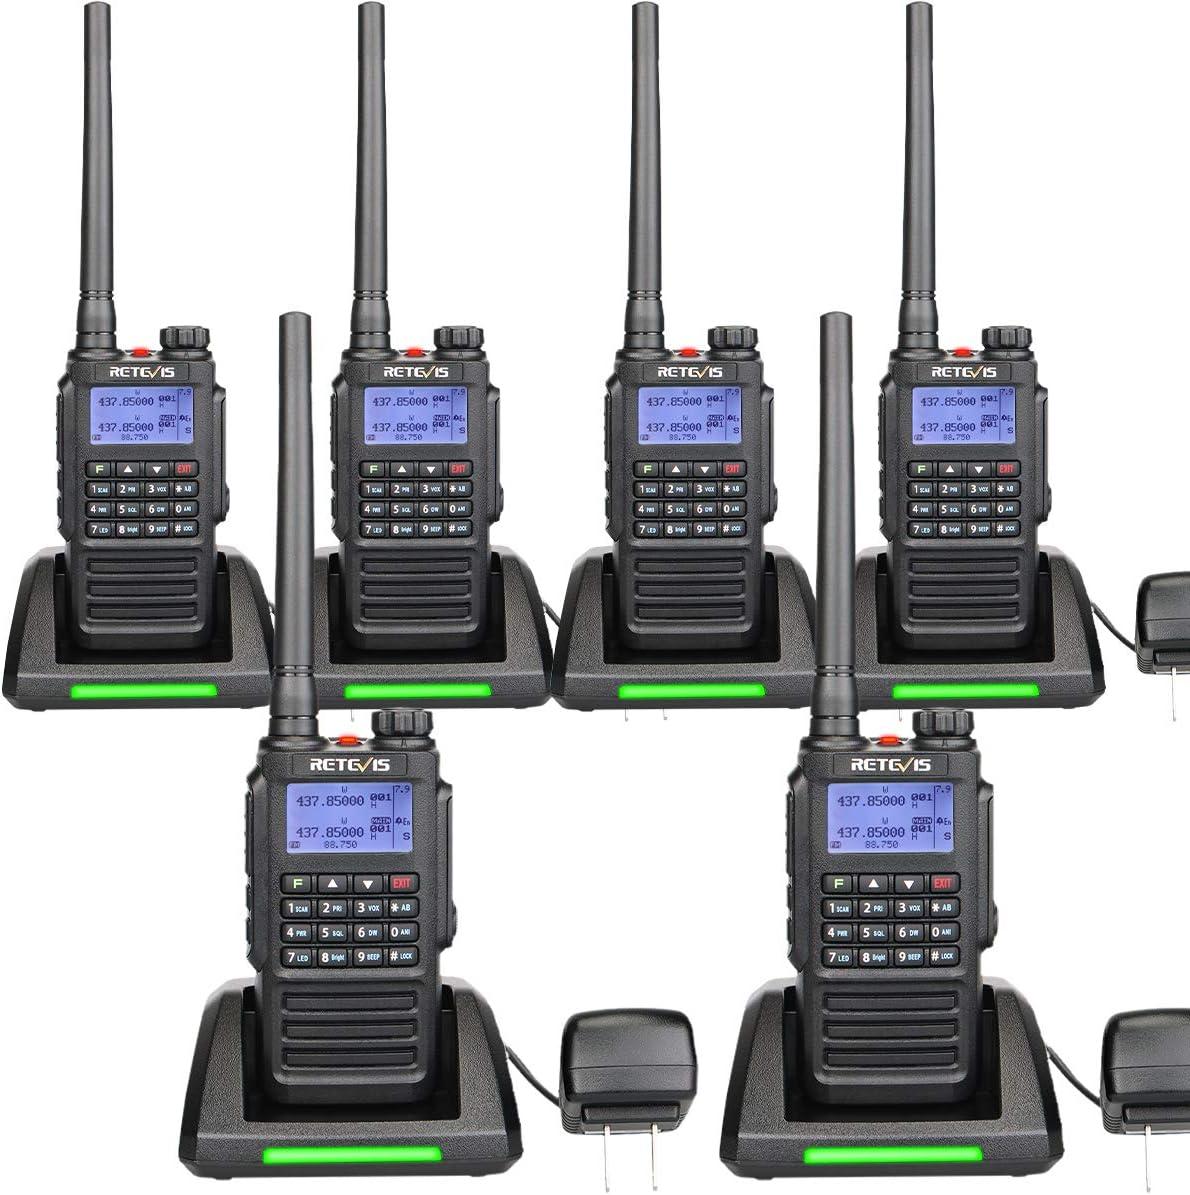 Retevis RT87 2 Way Radios Walkie Talkies Long Range Waterproof Dual Band Heavy Duty High Power Two Way Radio with LCD (6 Pack)